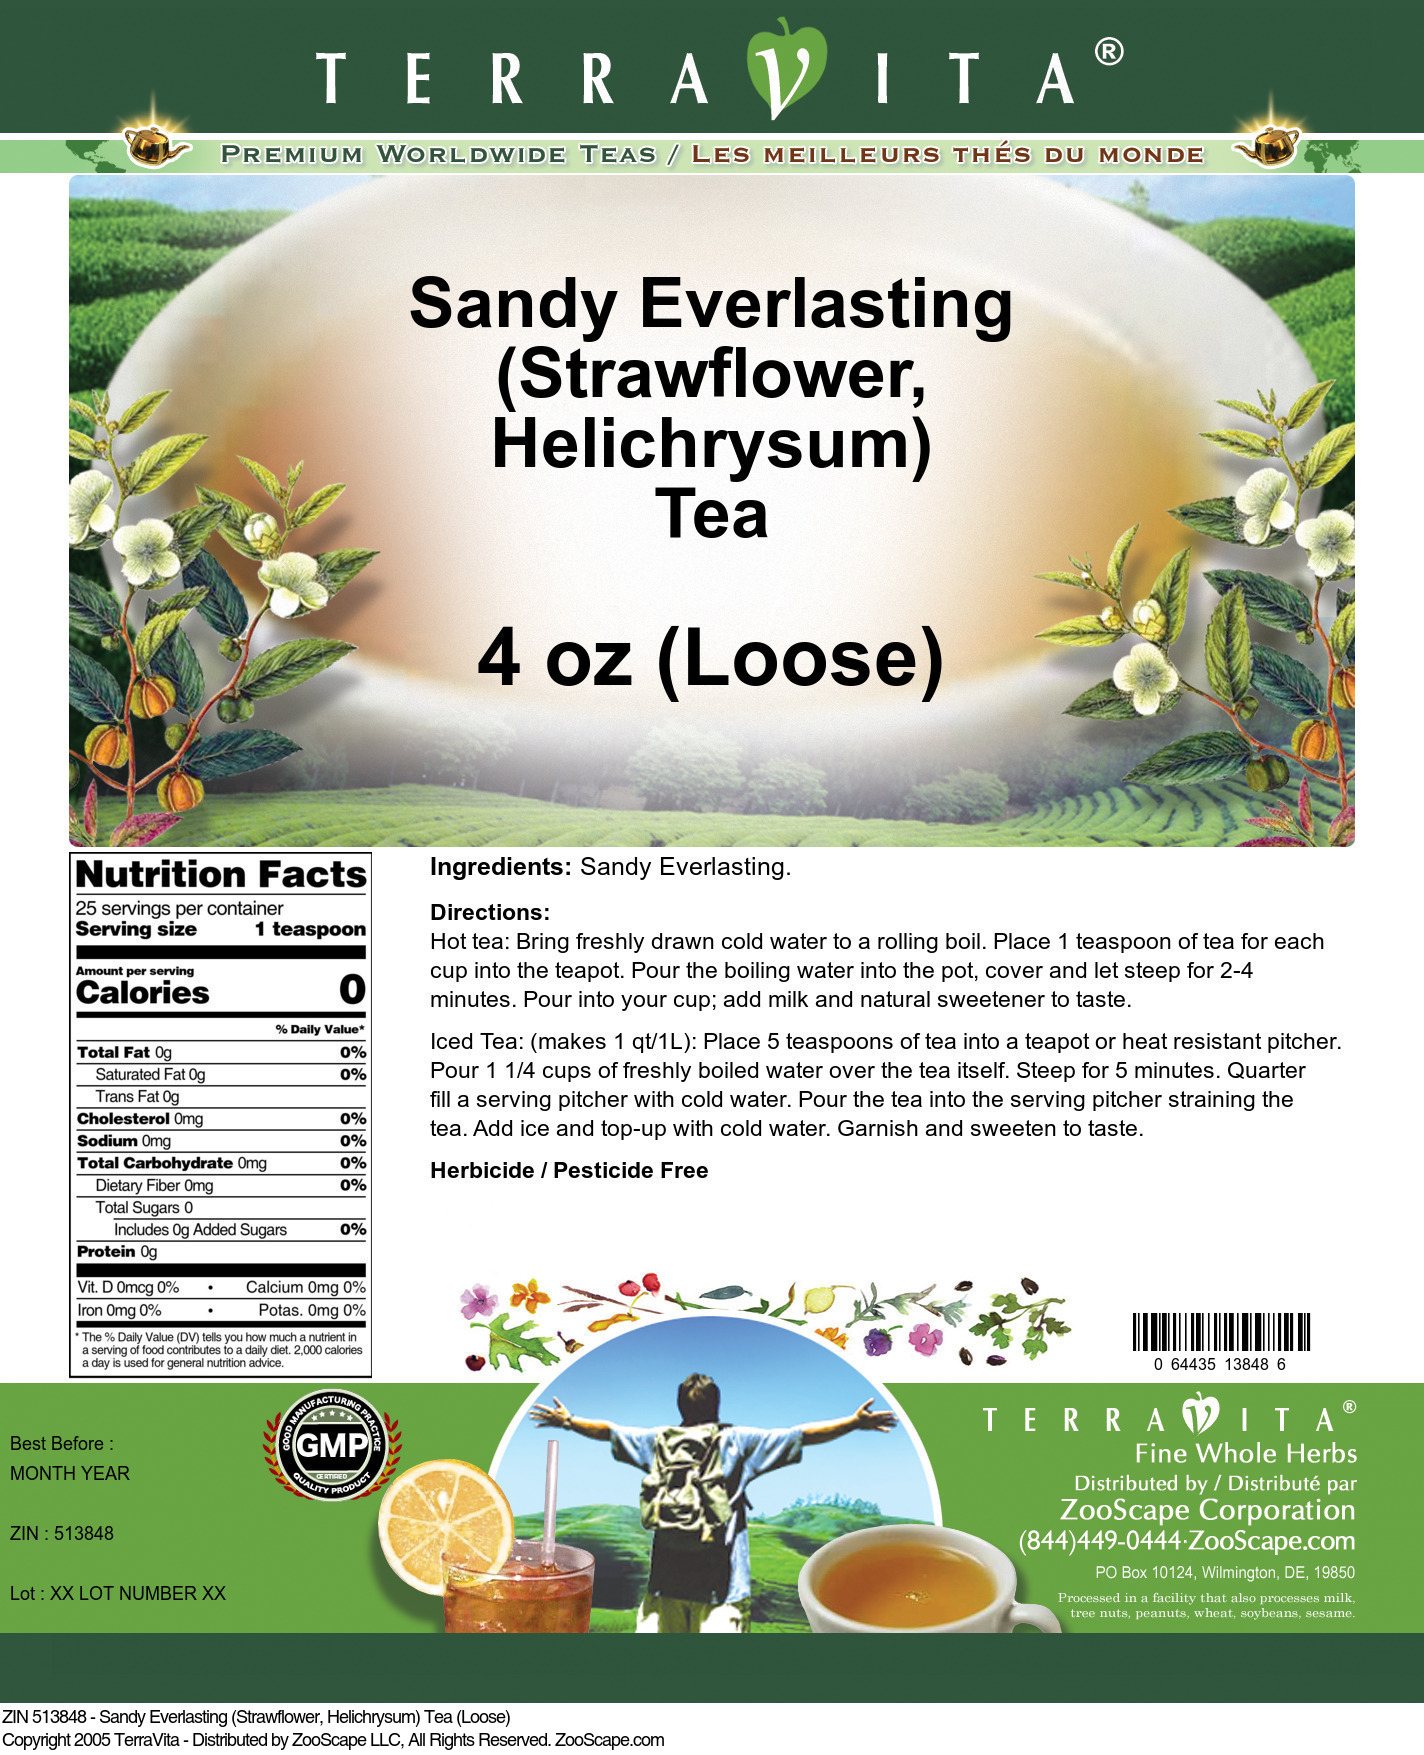 Sandy Everlasting (Strawflower, Helichrysum) Tea (Loose)